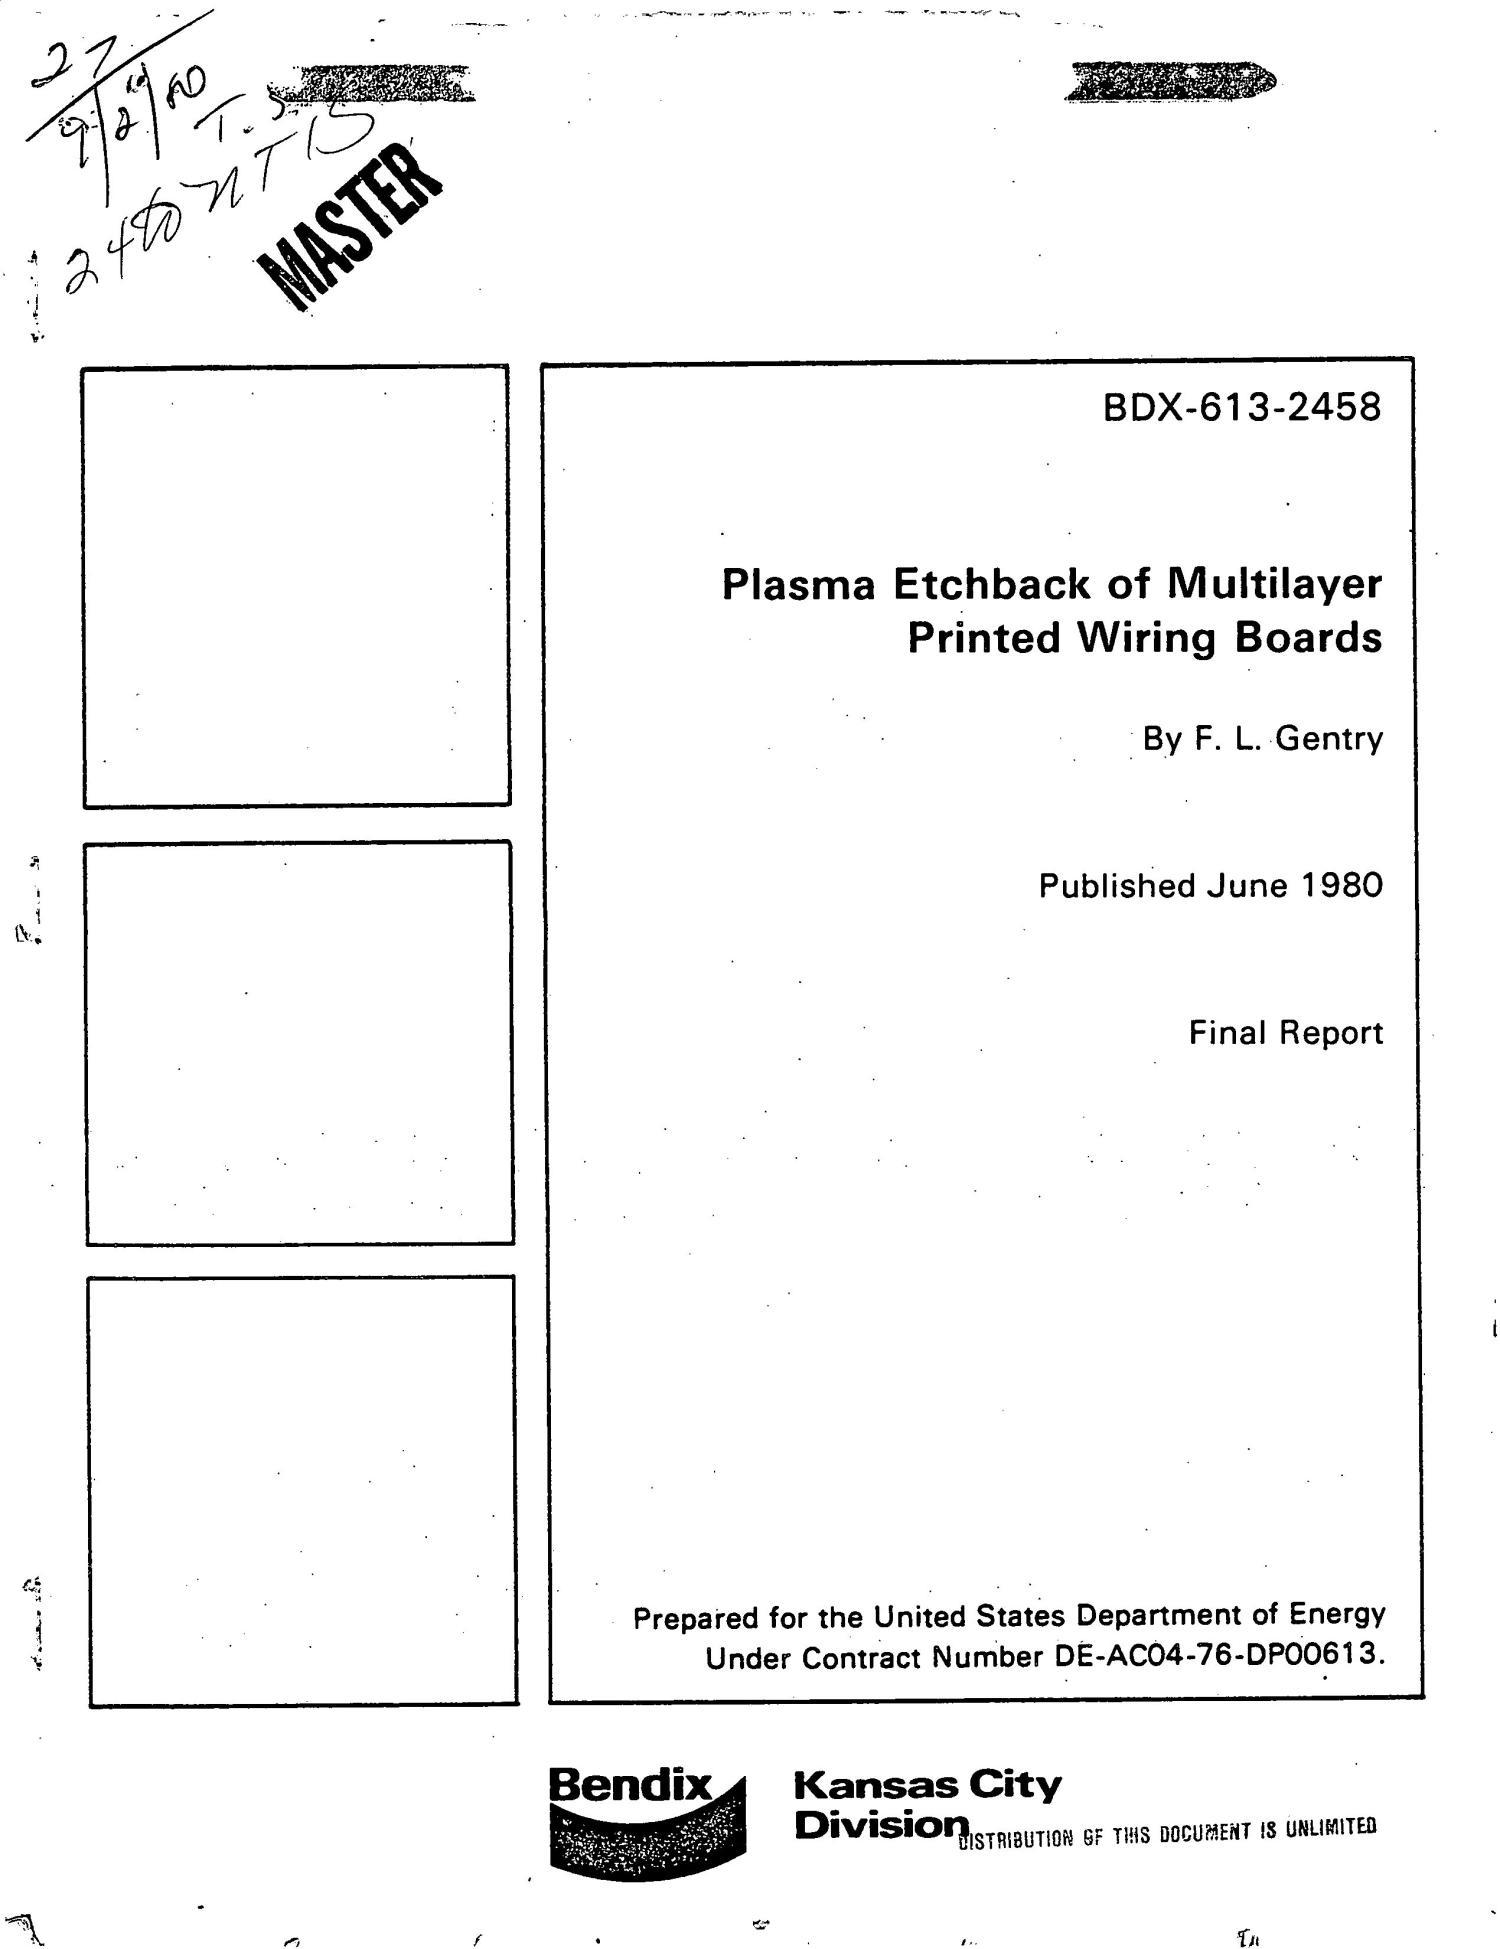 Plasma Etchback Of Multilayer Printed Wiring Boards Digital Library Board